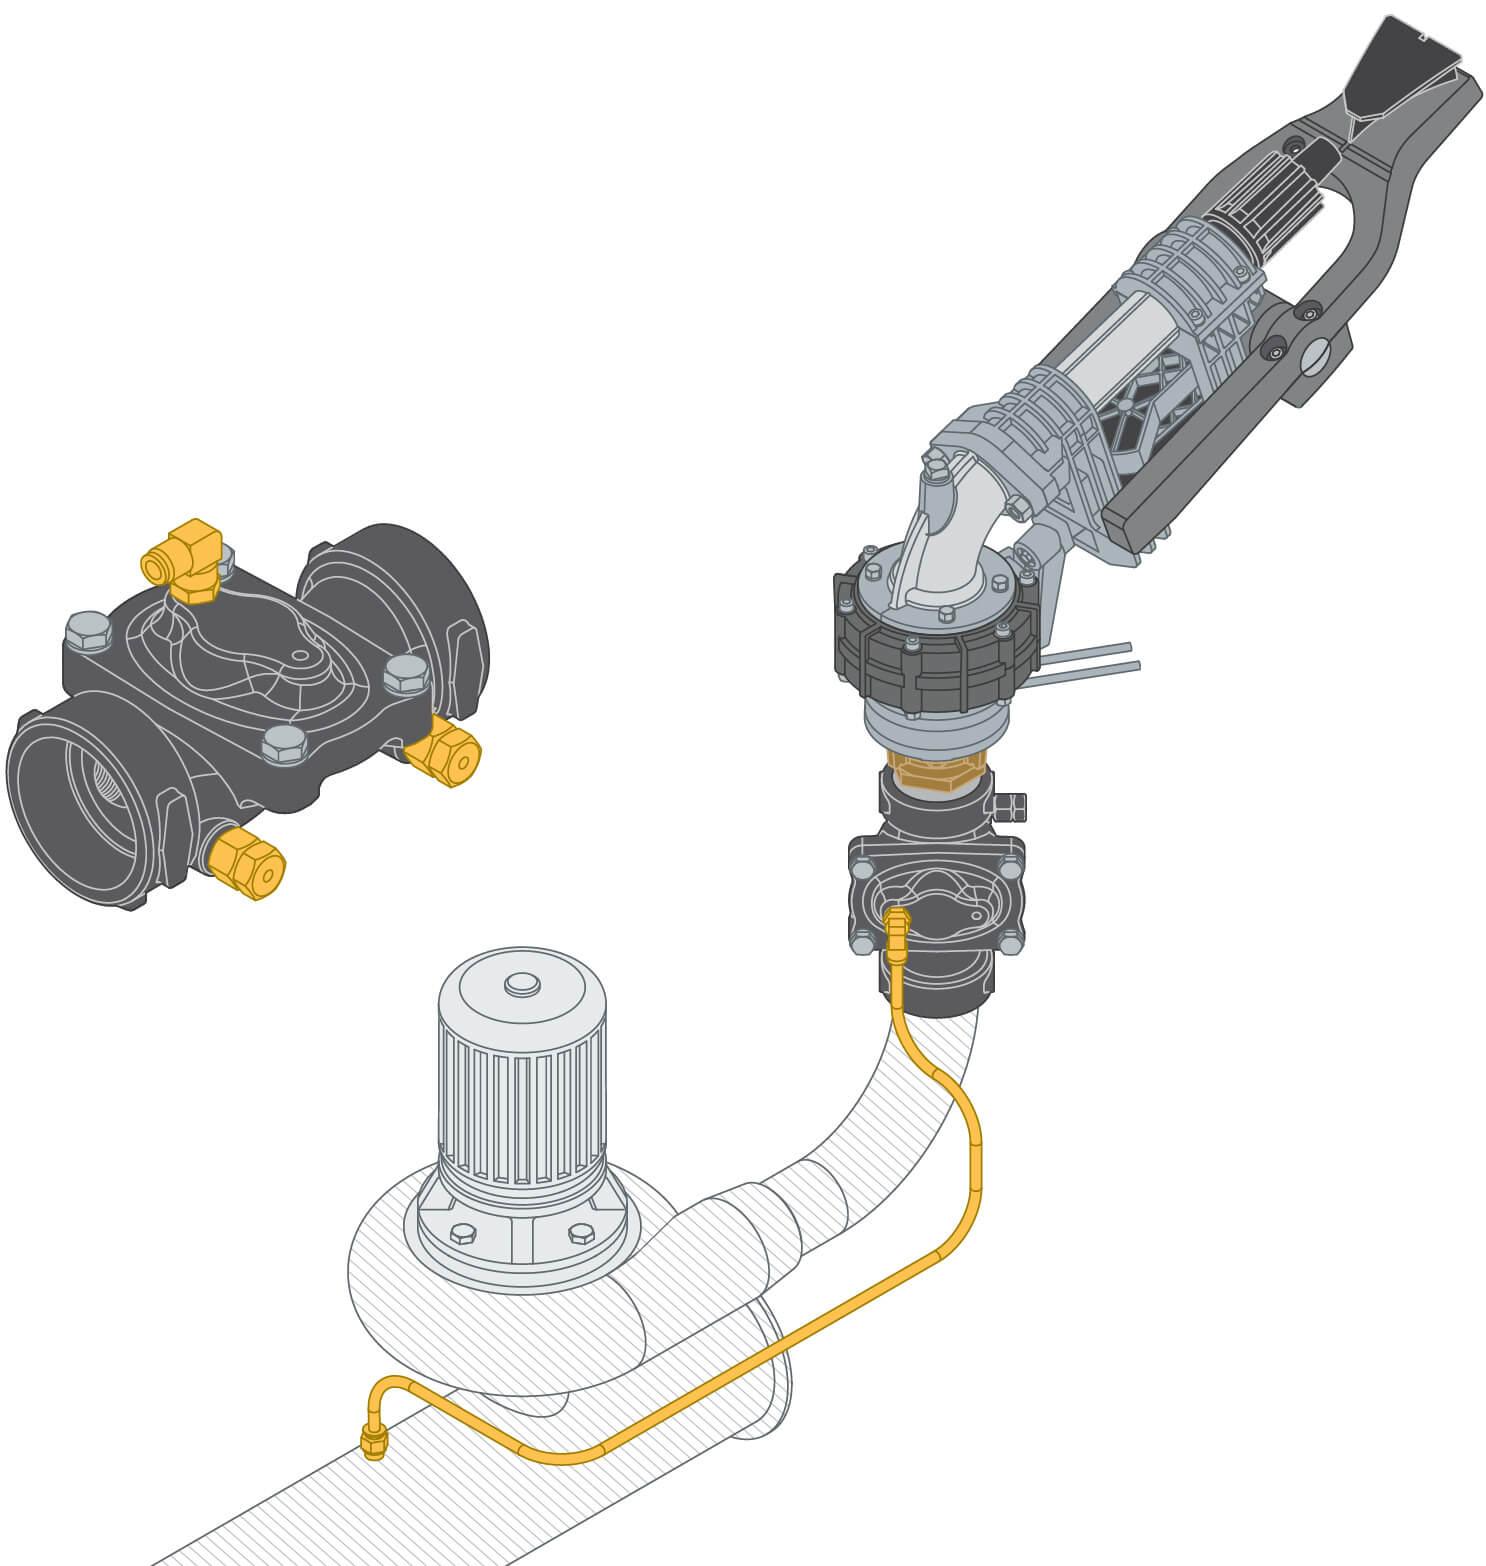 Komet 850 Valve - Differential Pressure Operation